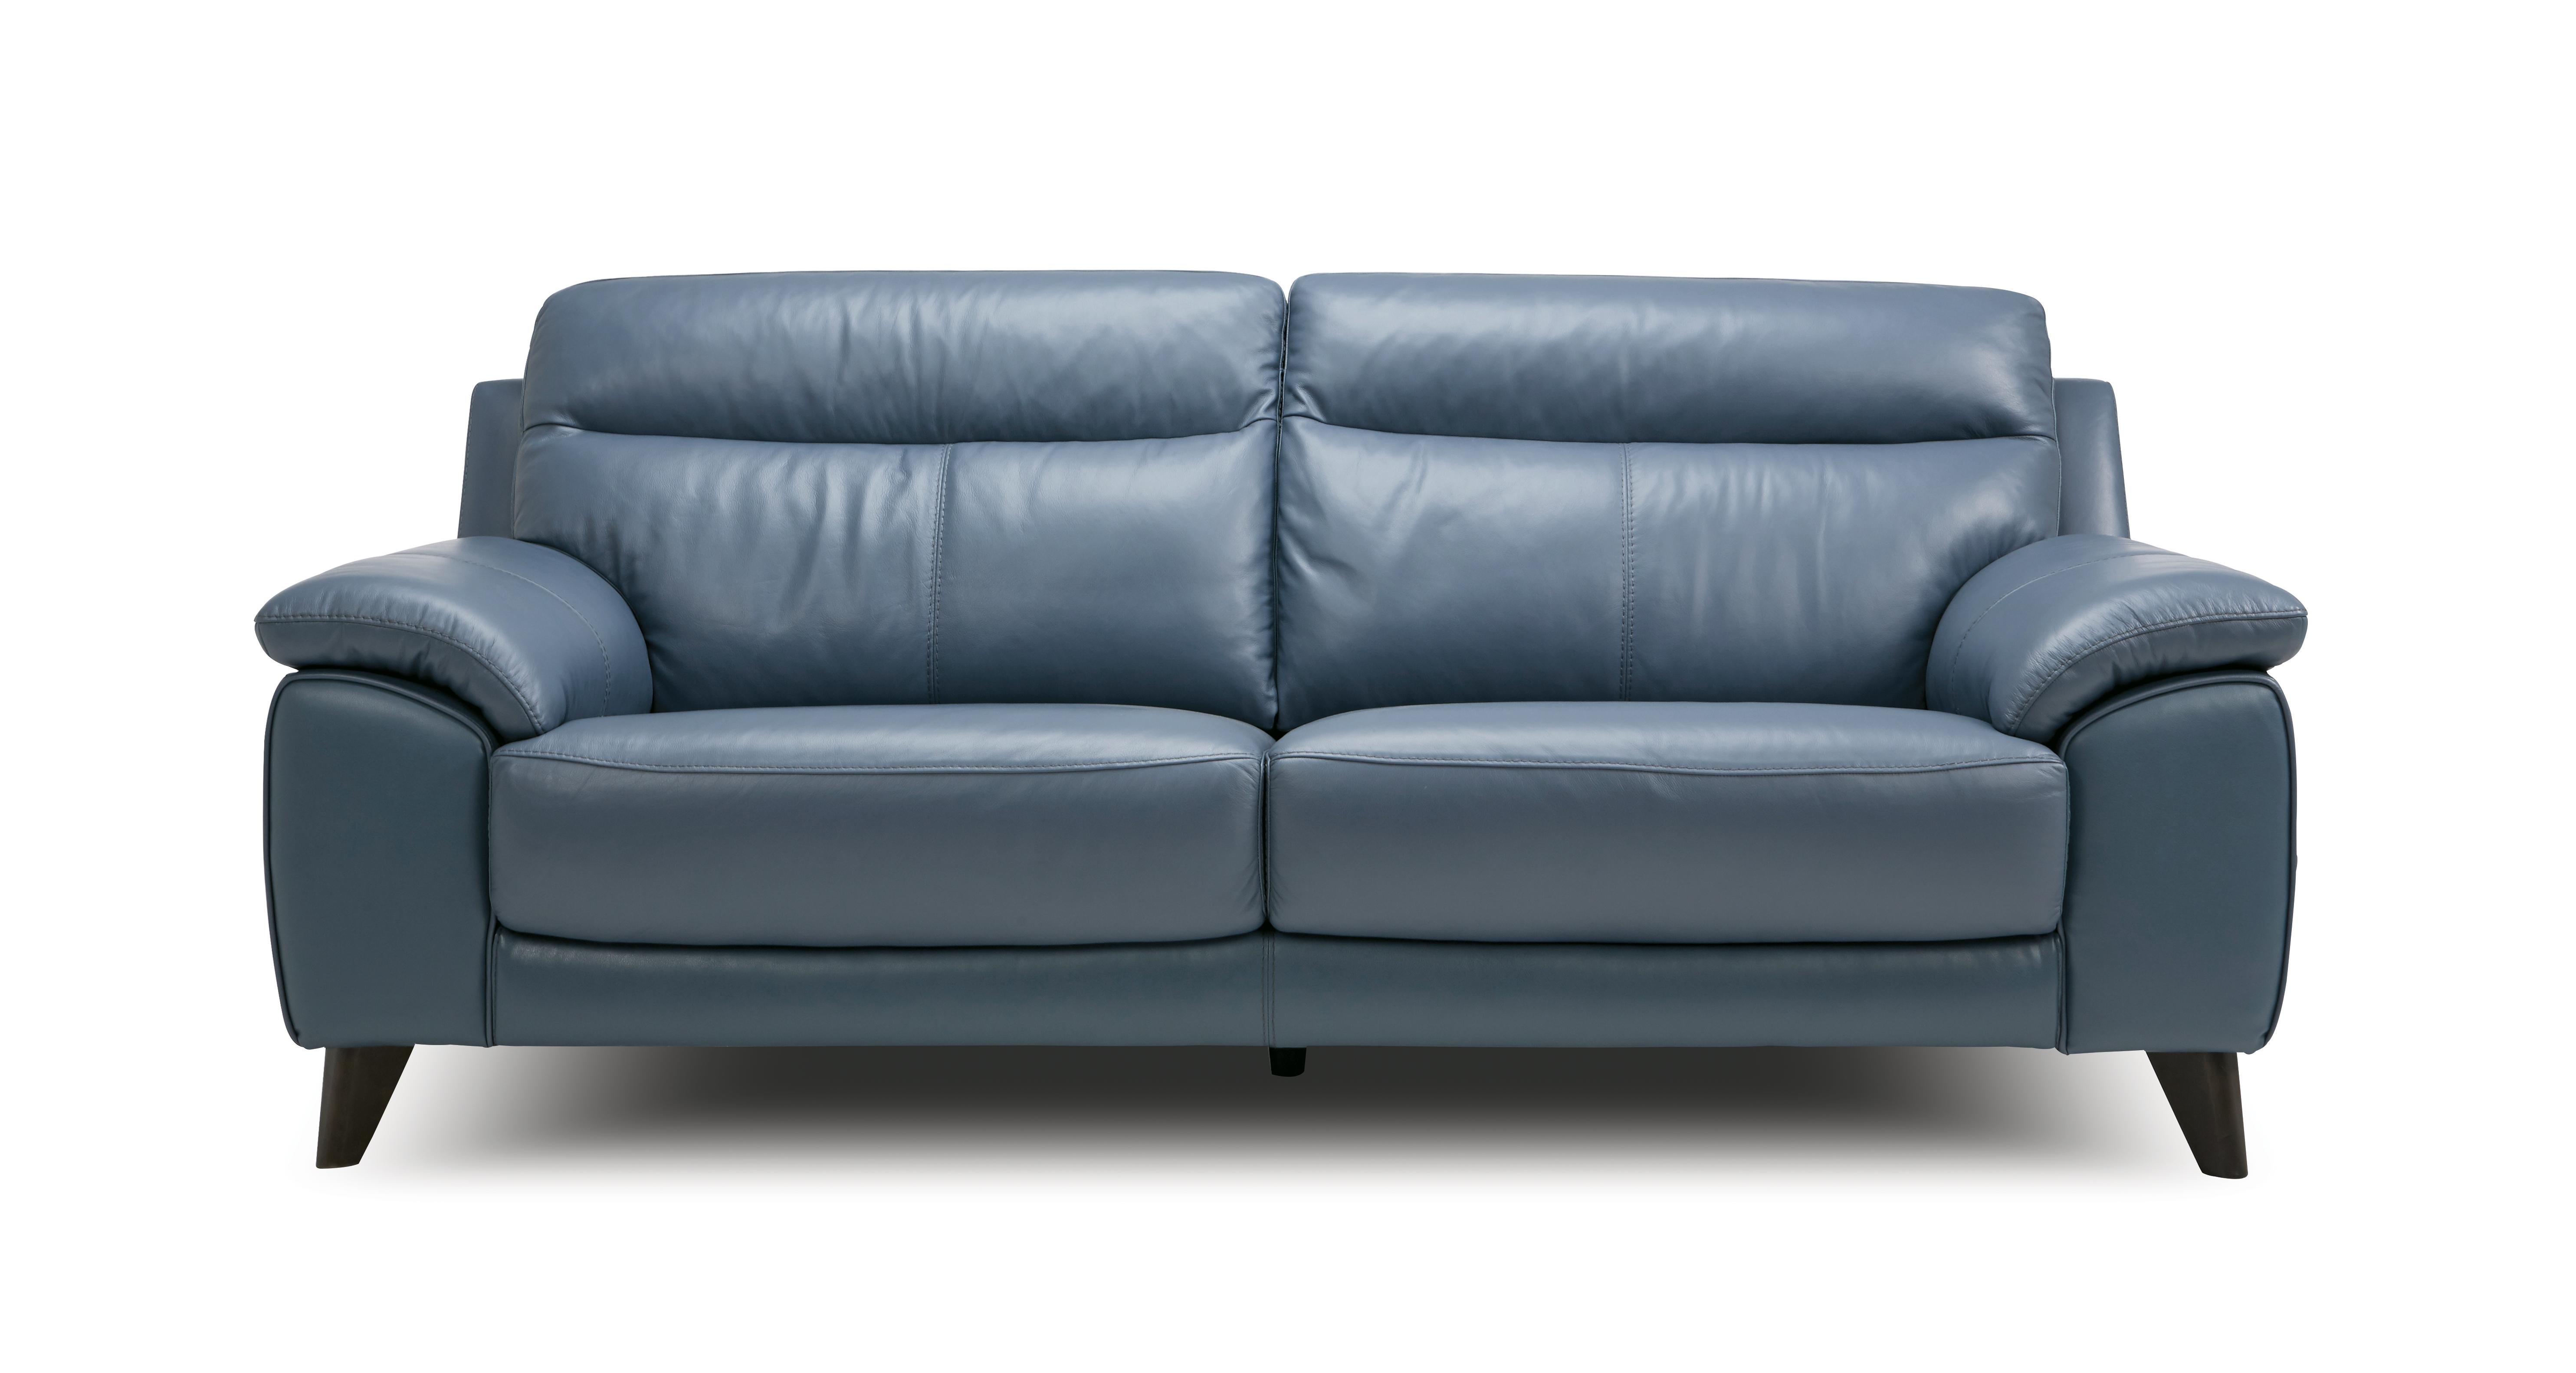 denim sofas uk wooden sofa cushions online india brokeasshome